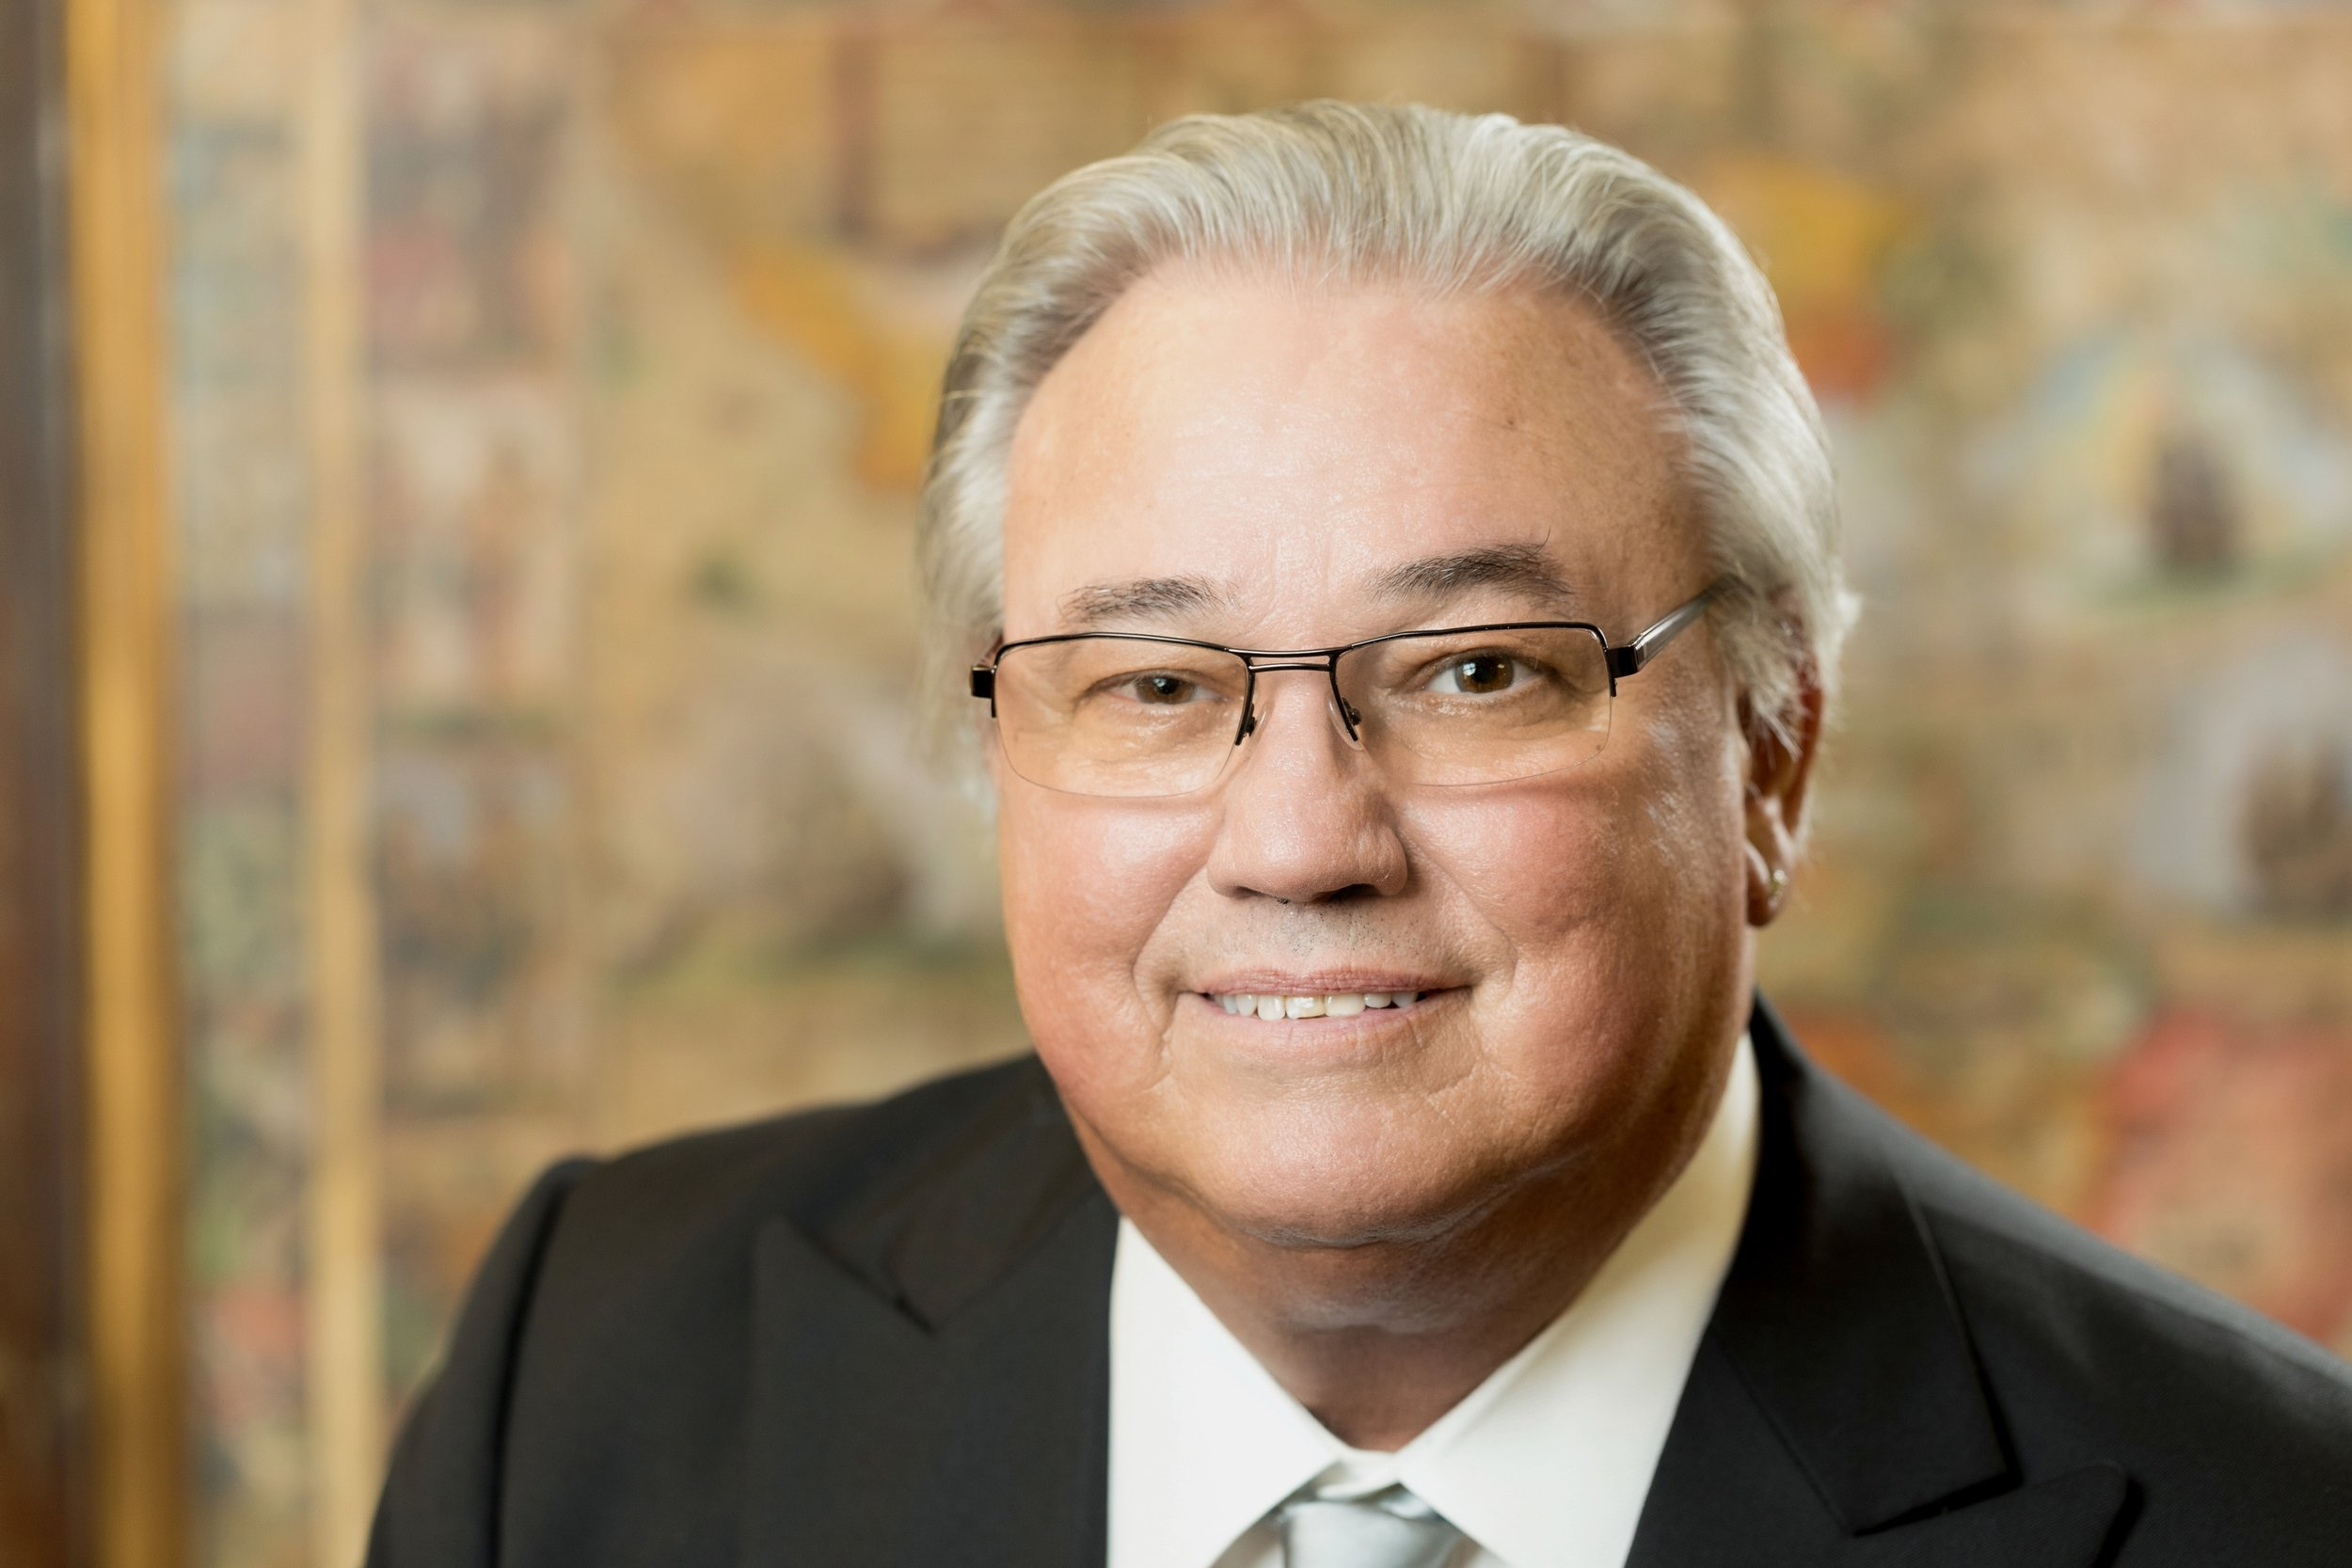 David R. Benoit, Senior Energy Consultant, BlackRose Advisors